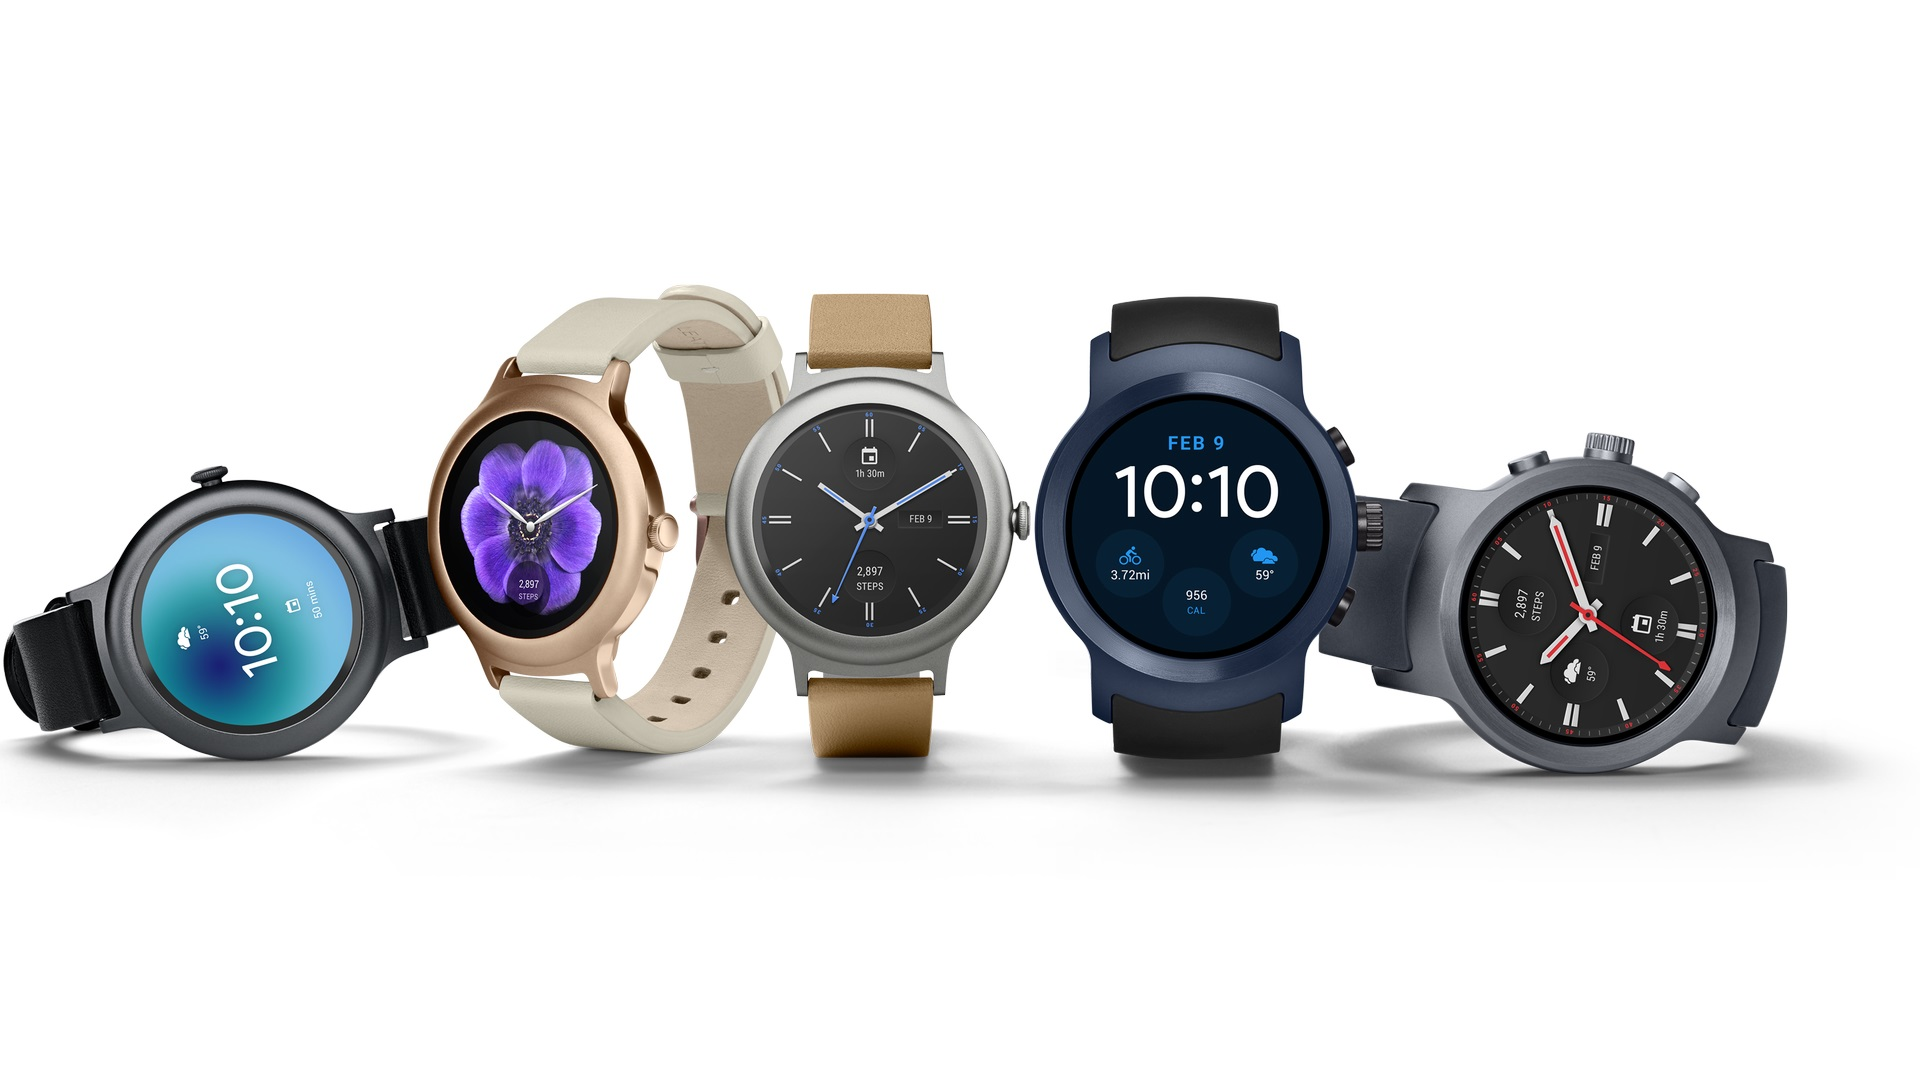 Google、Android Wear 2.0を初期搭載した新型スマートウォッチ「LG Watch Style / Sport」を発表、2月10日から発売